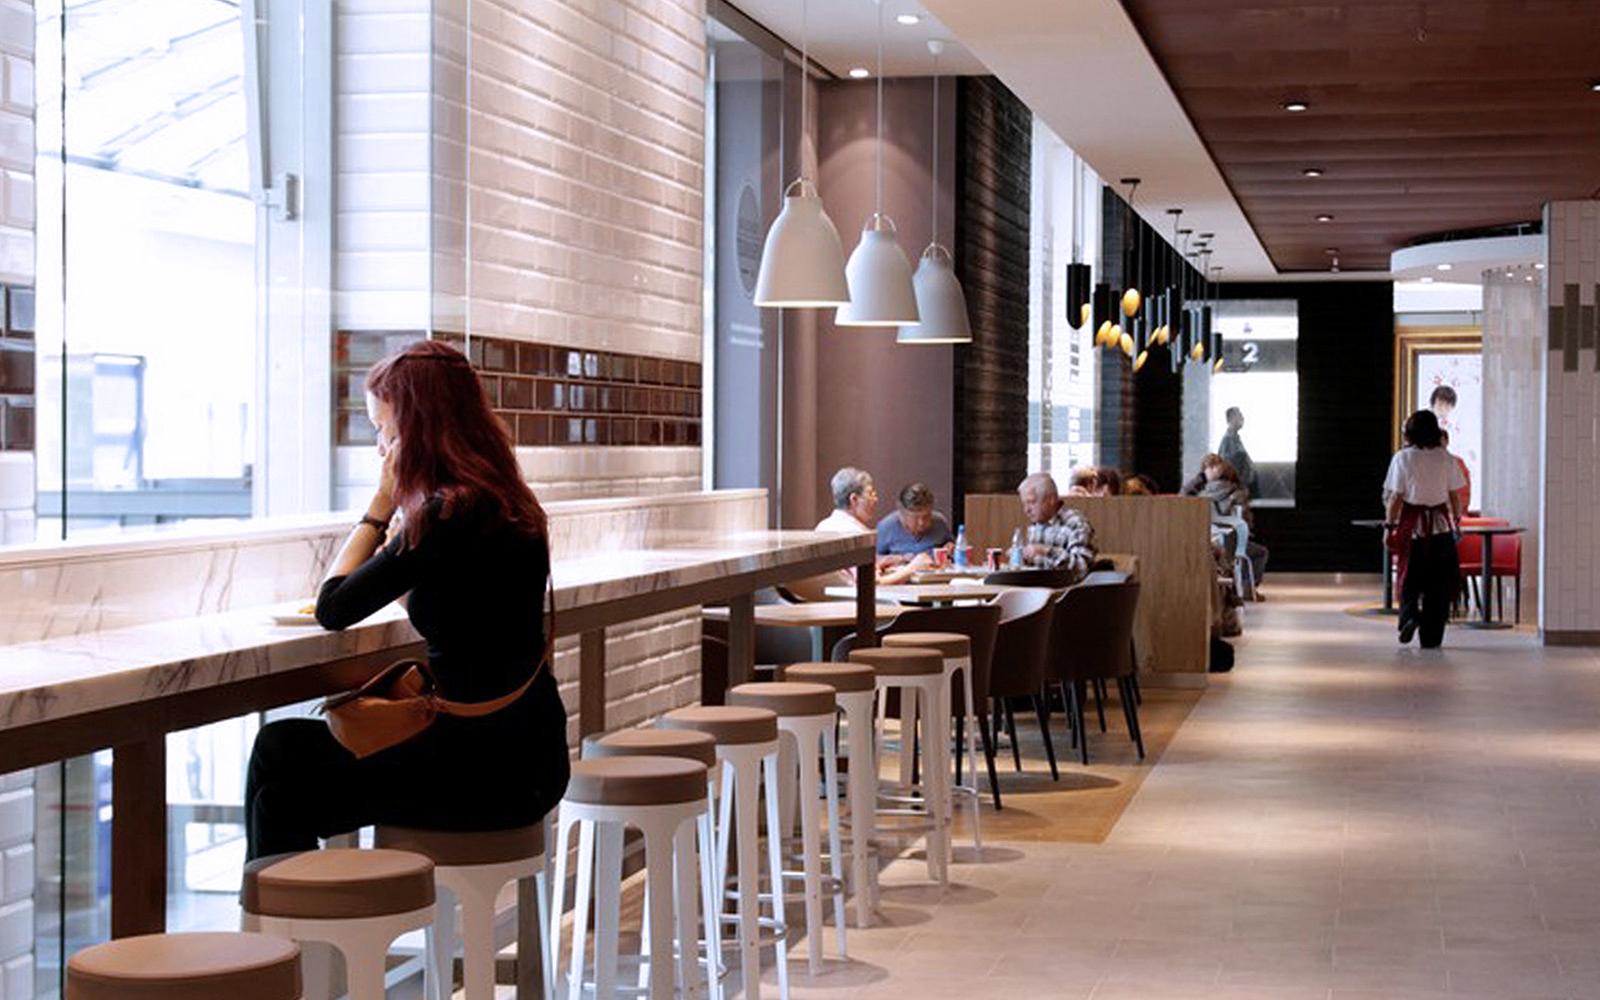 Foodcourt customer seating area